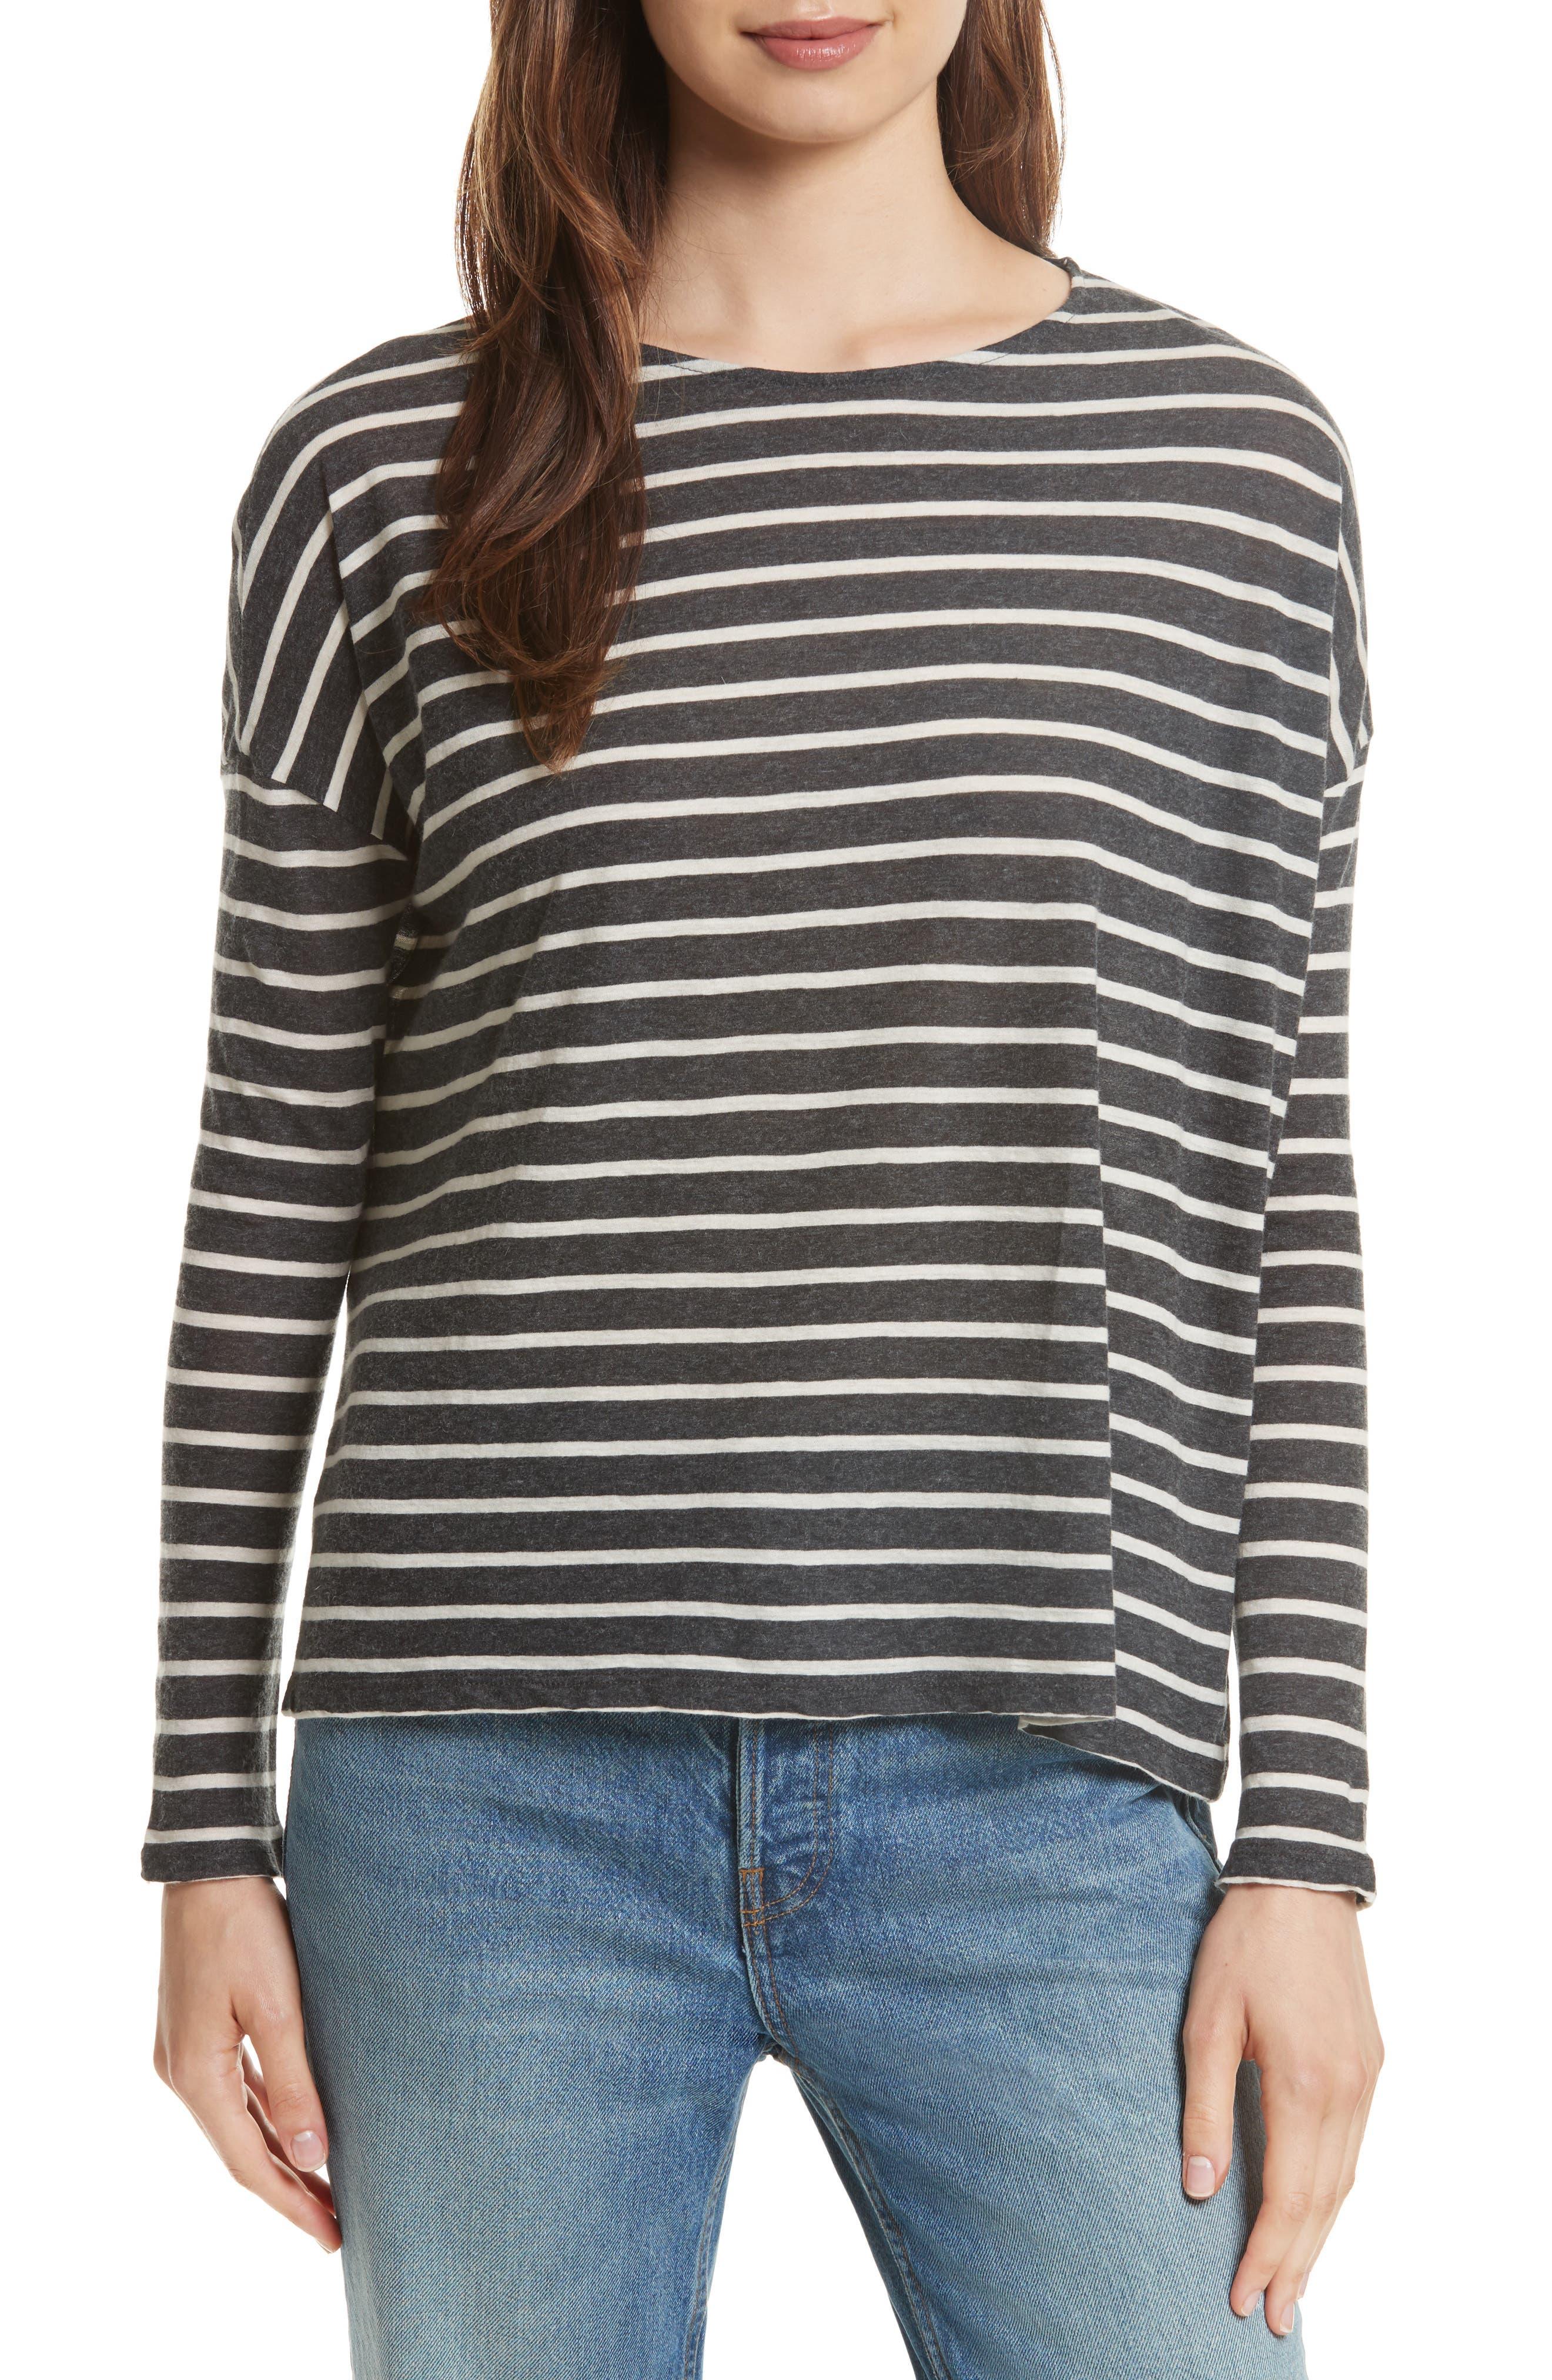 Alternate Image 1 Selected - Majestic Filatures Stripe Cotton & Cashmere Boatneck Top